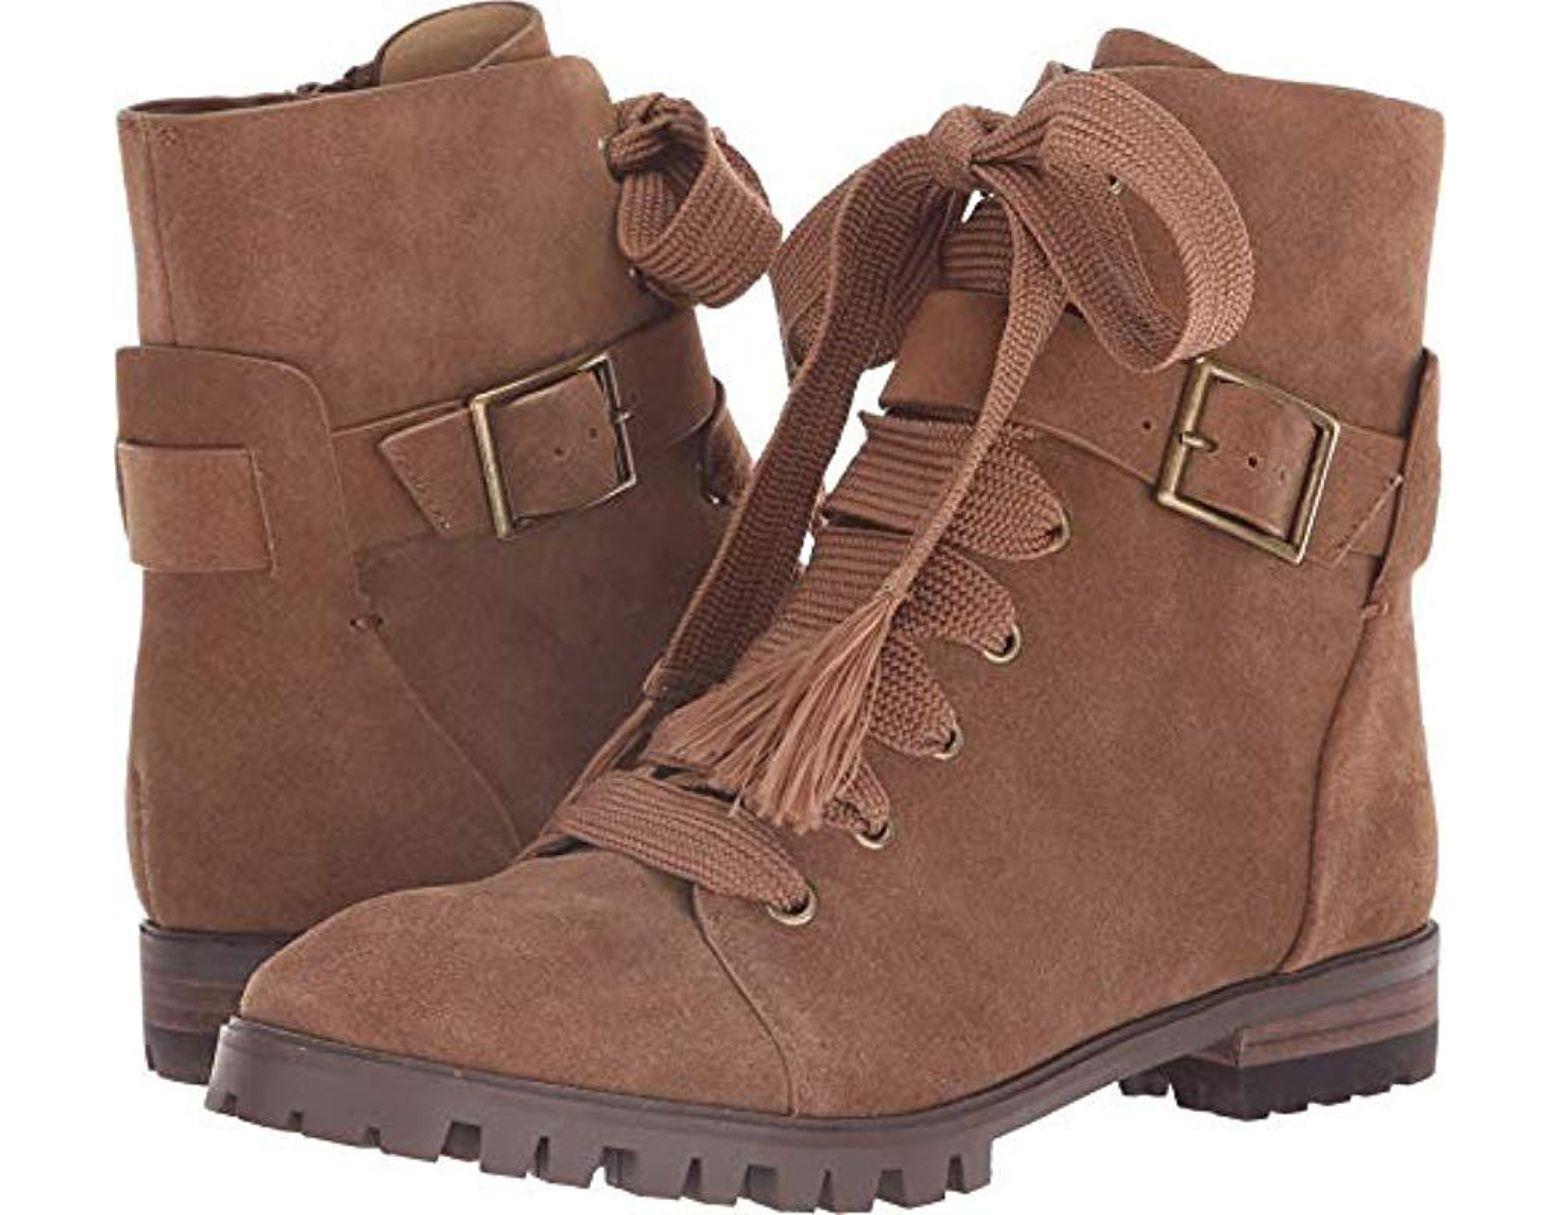 df884f2357620 Women's Brown Celine Ankle Boot